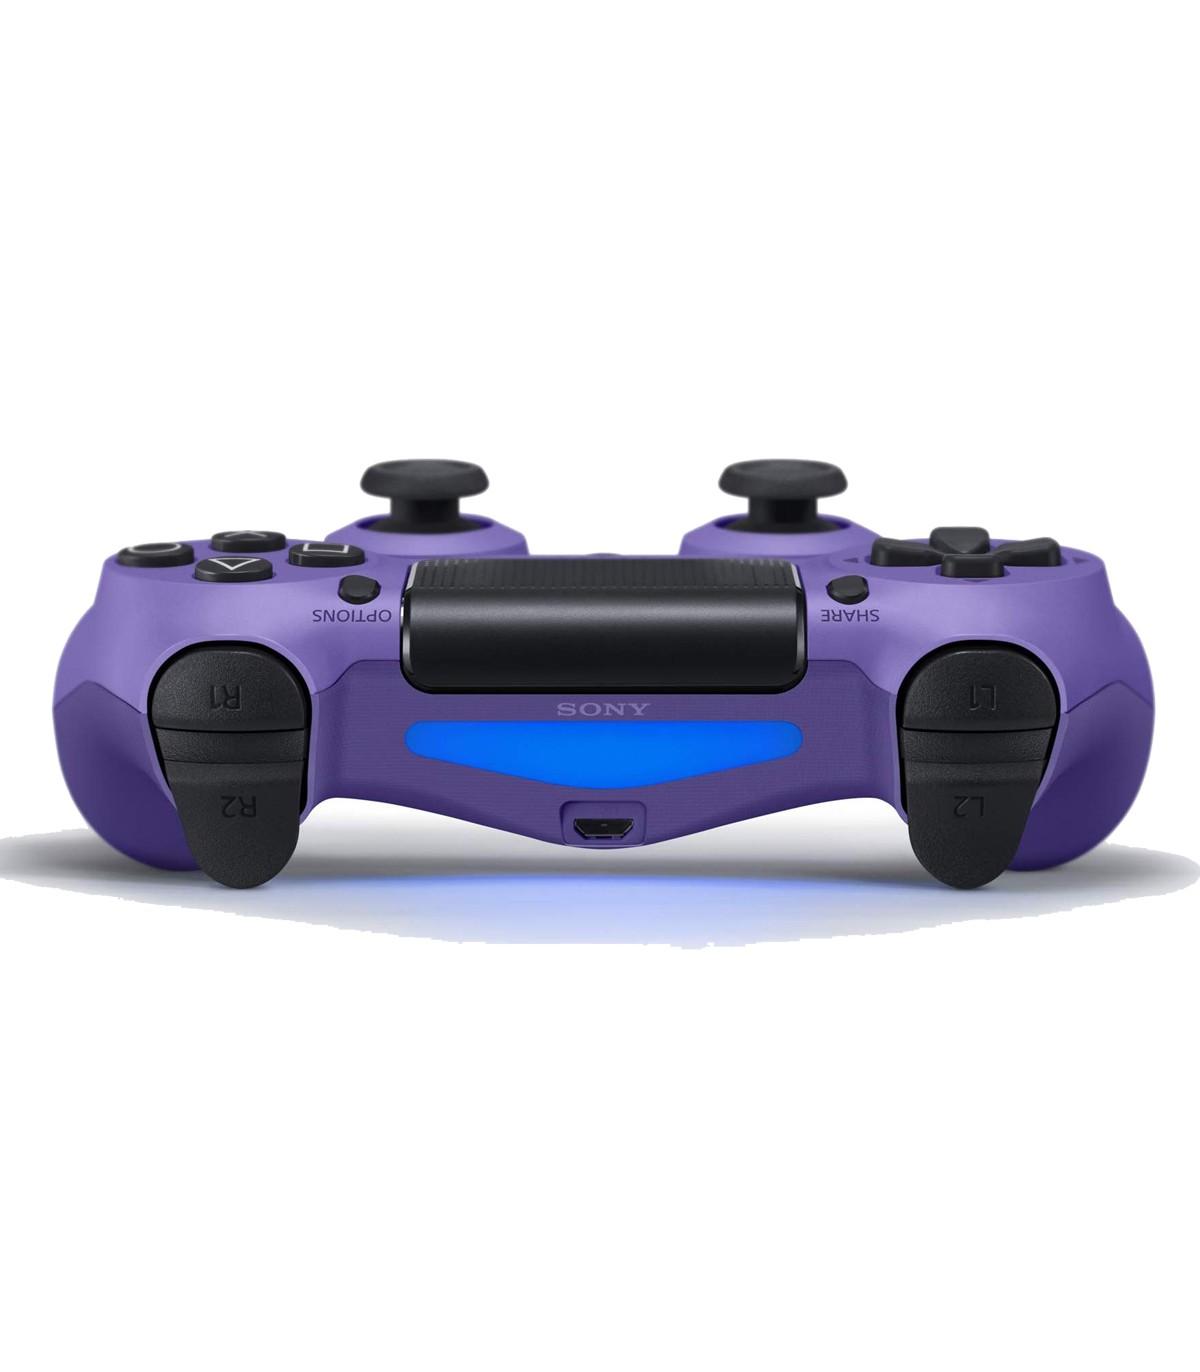 دسته DualShock 4 Wireless Controller بنفش - پلی استیشن 4